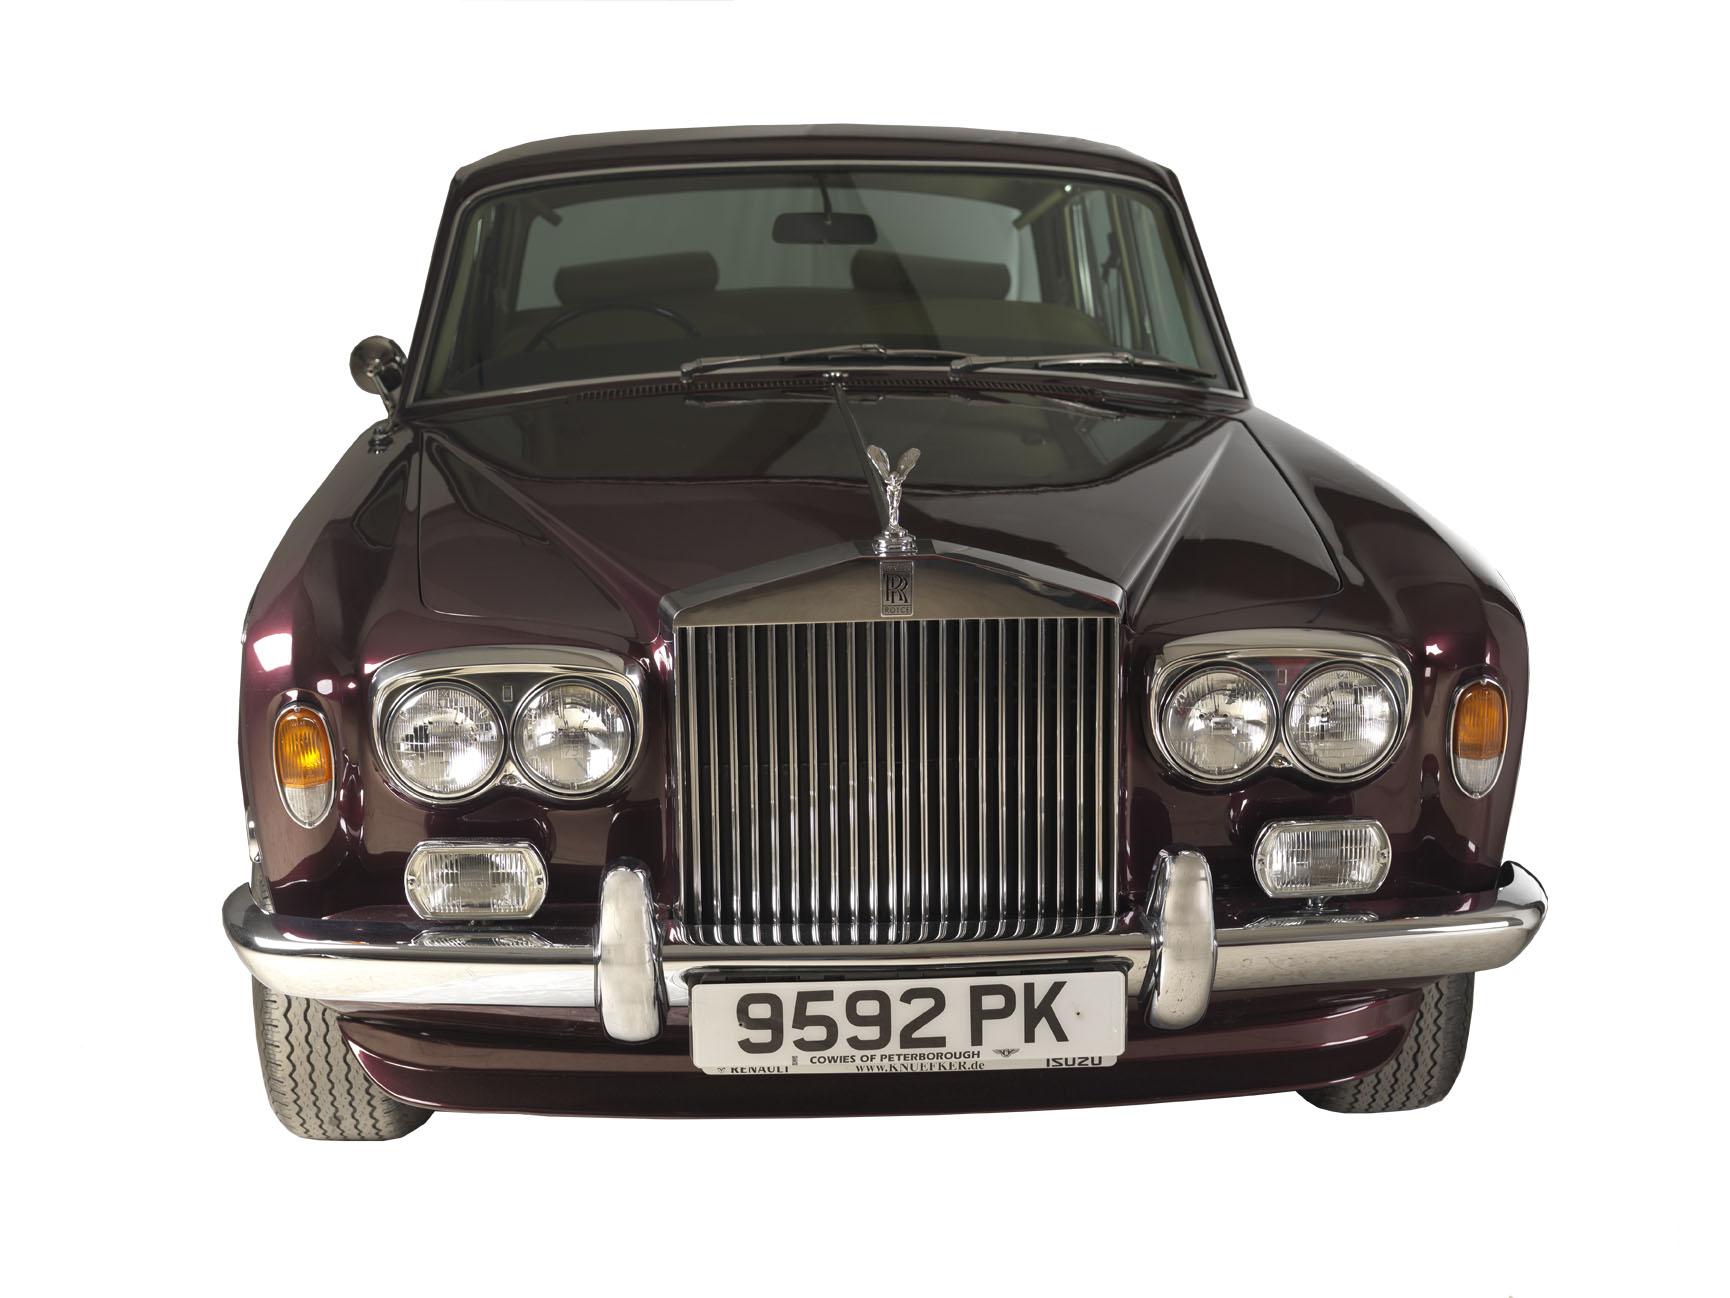 Noleggio Rolls Royce Silver Shadow per giornate